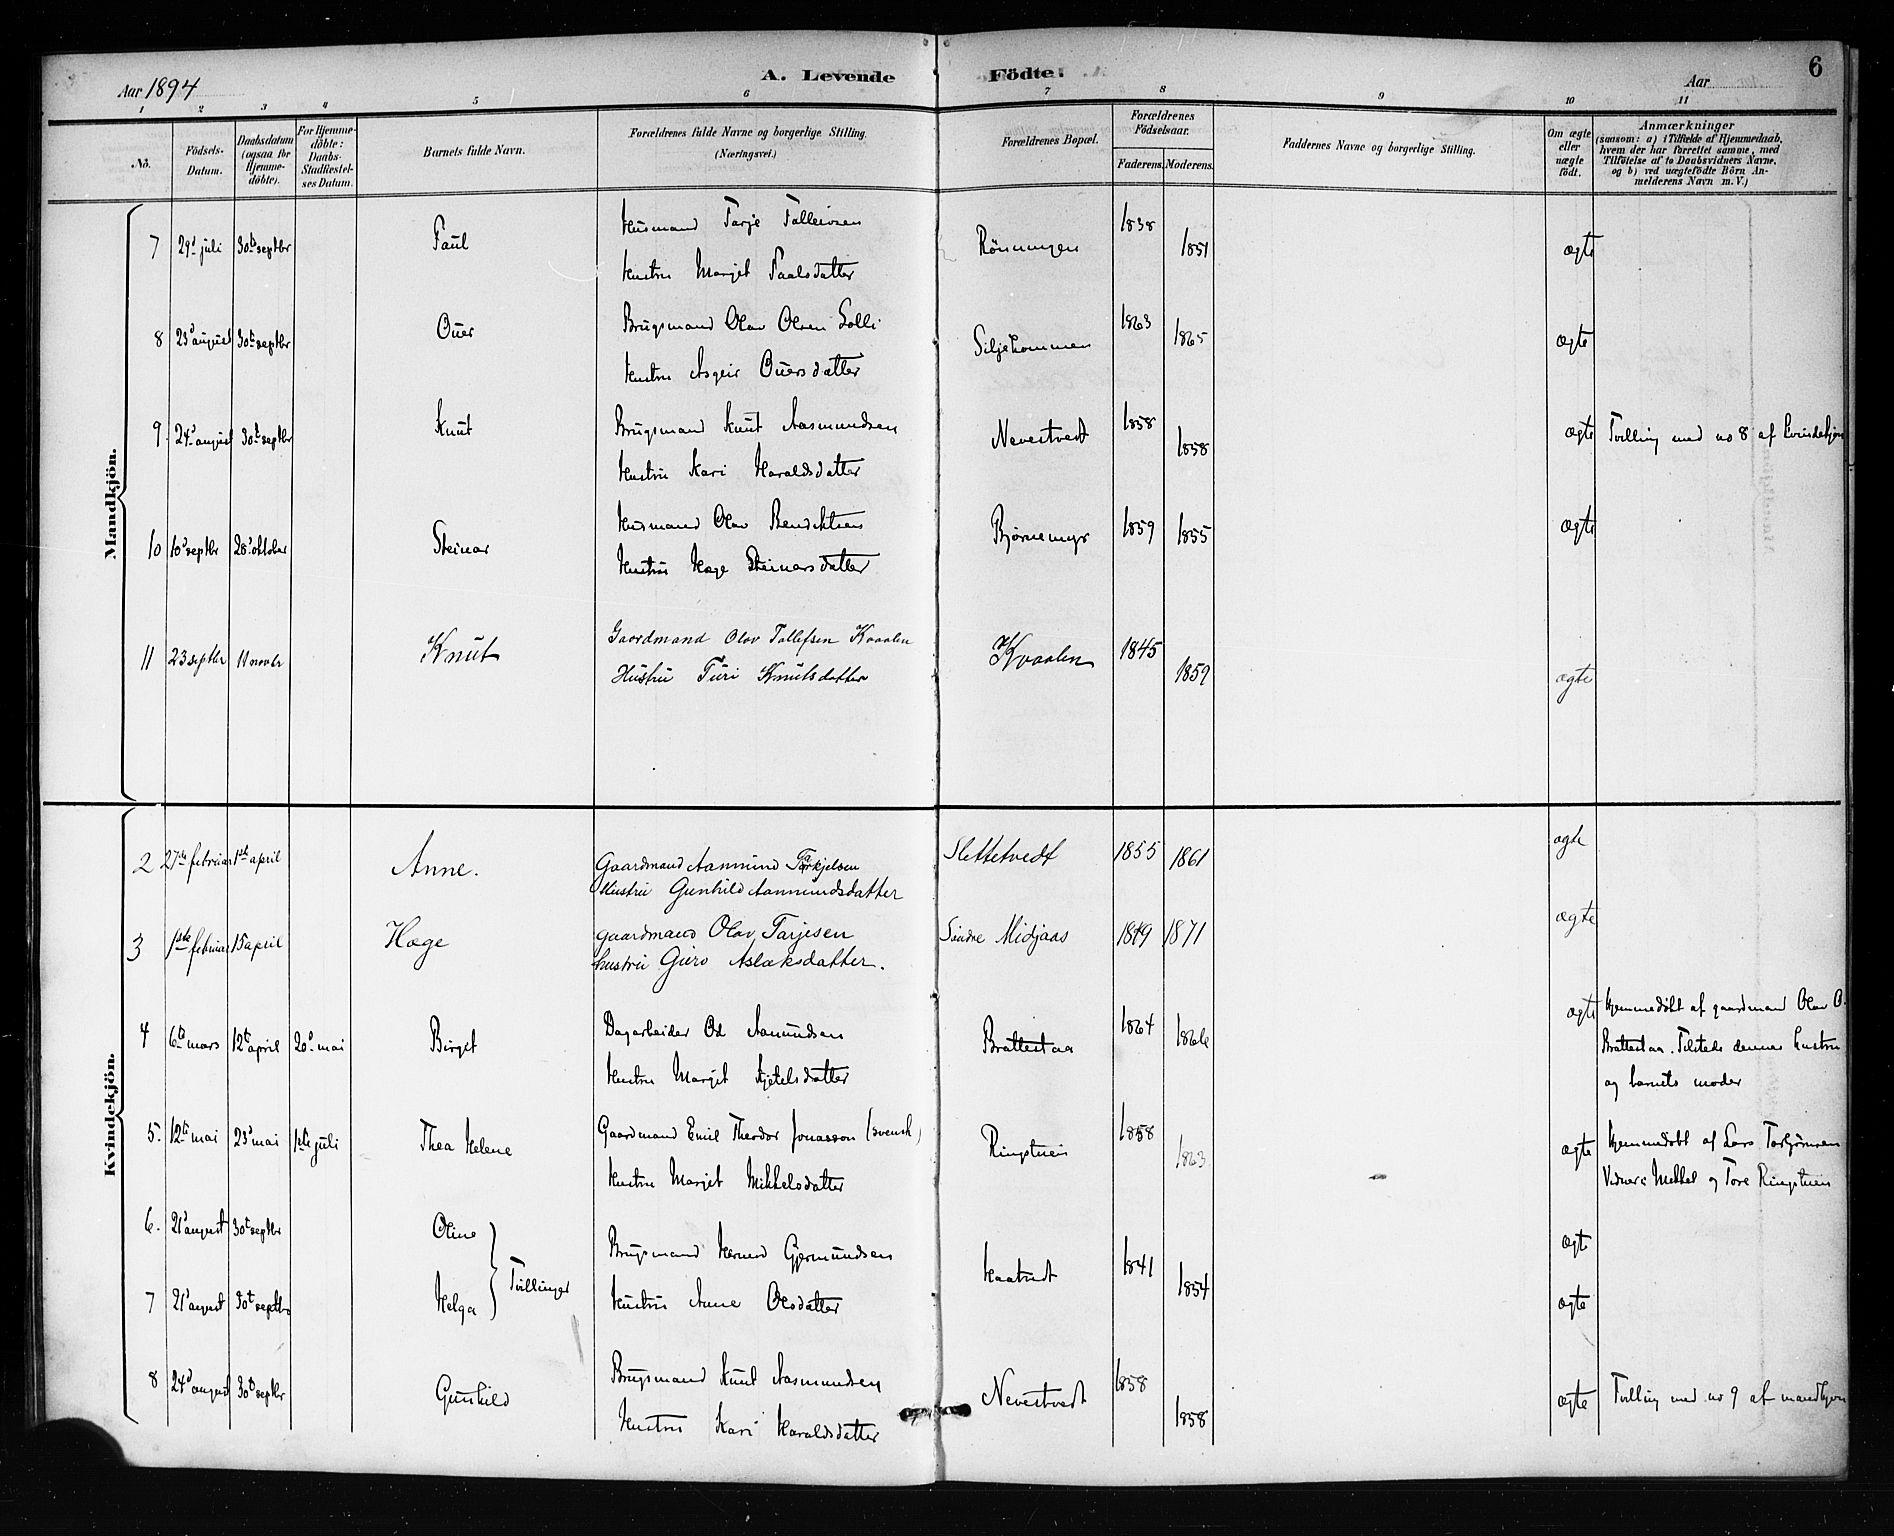 SAKO, Mo kirkebøker, G/Ga/L0002: Klokkerbok nr. I 2, 1892-1914, s. 6